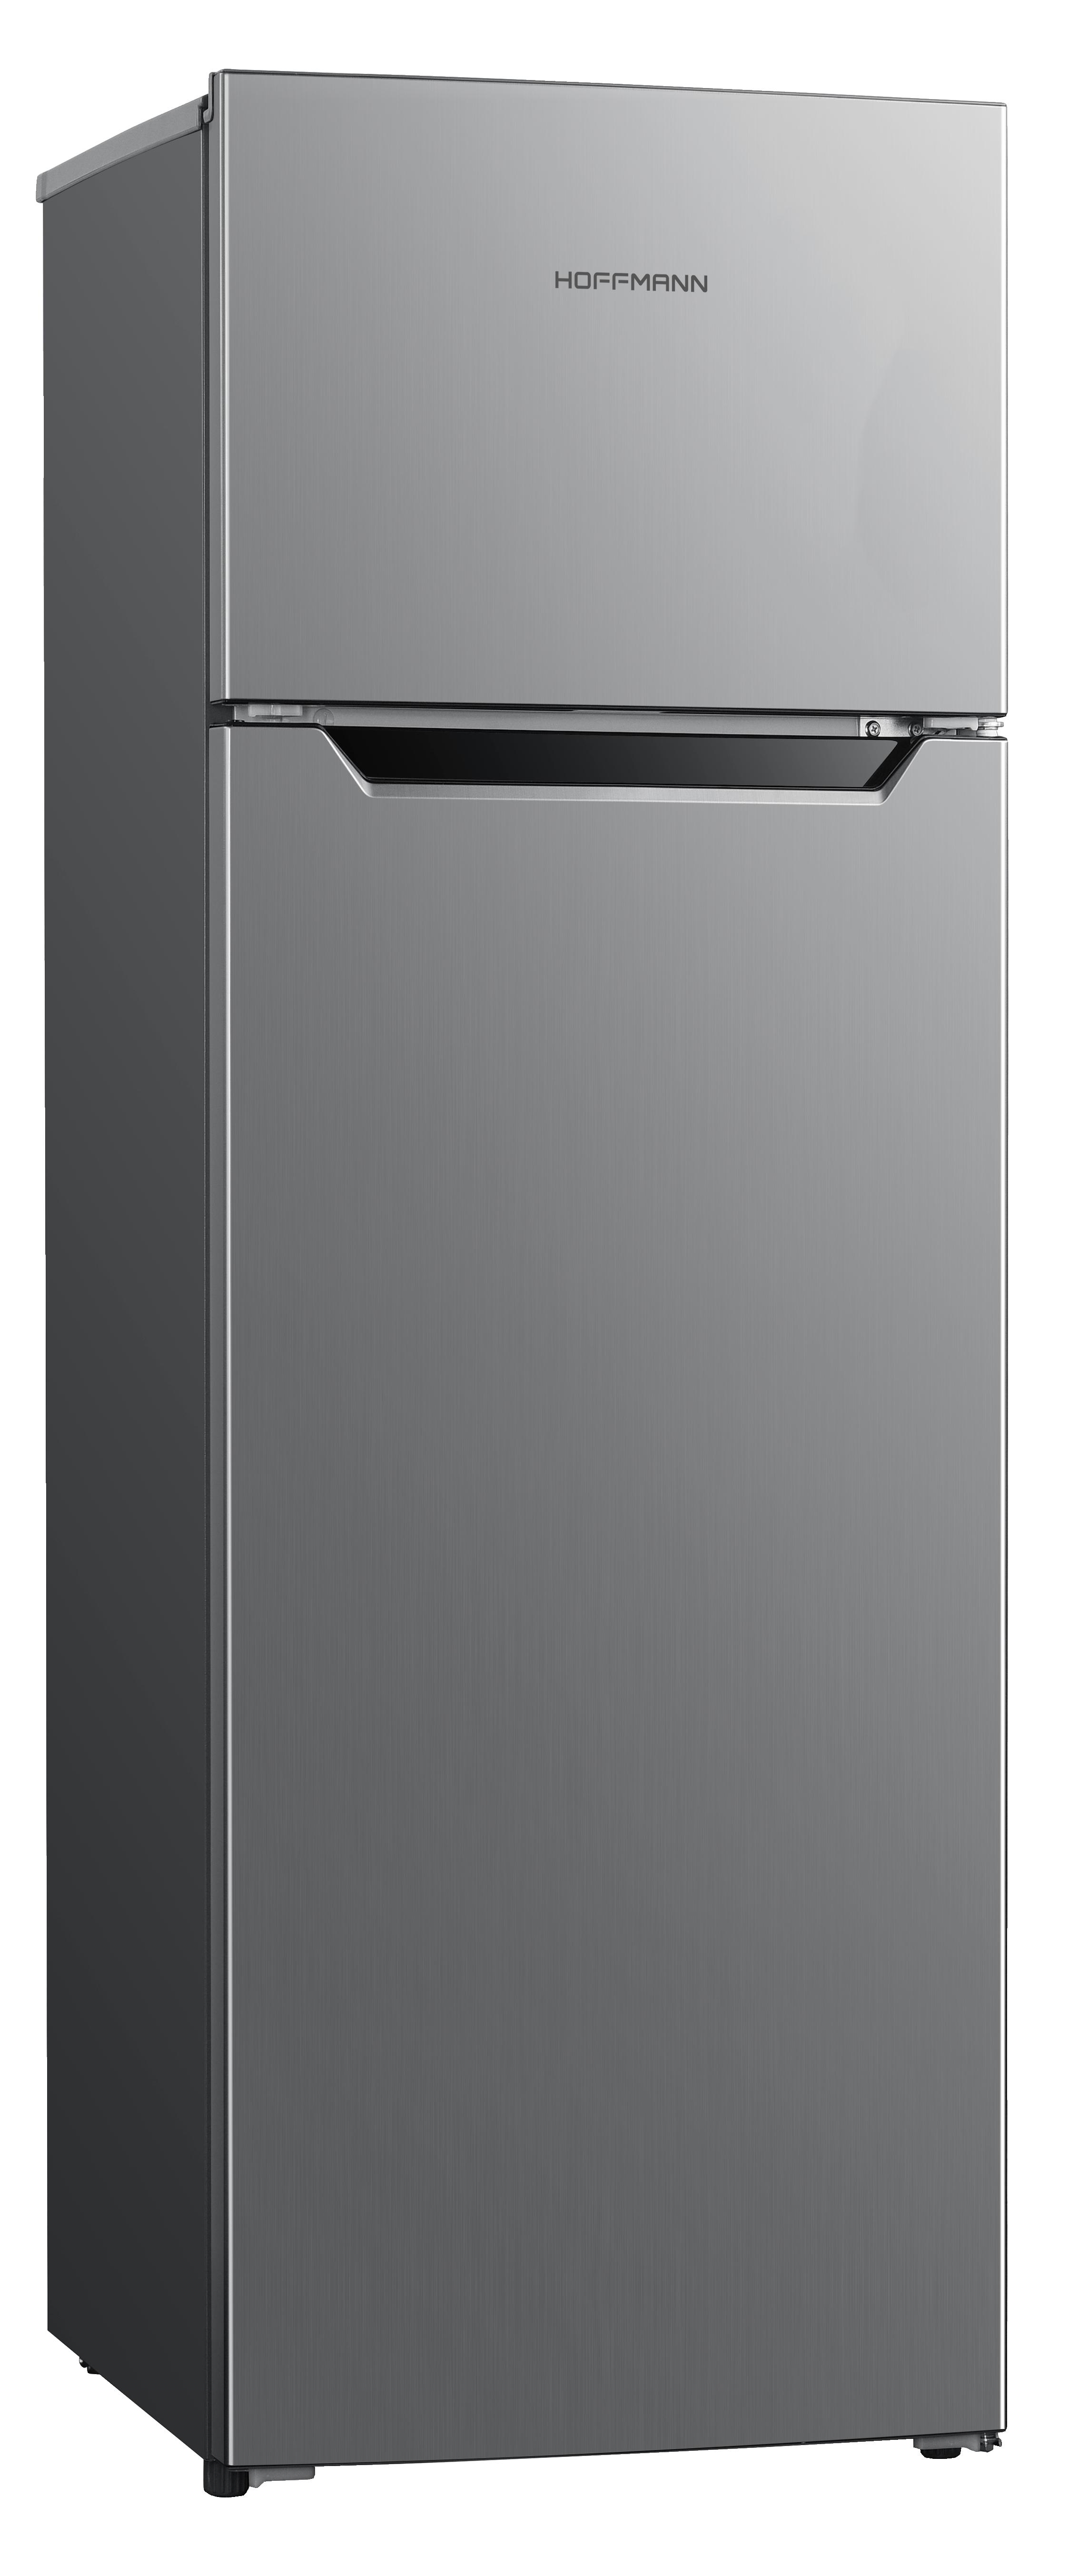 Холодильник HOFFMANN DFT-167S  - 1